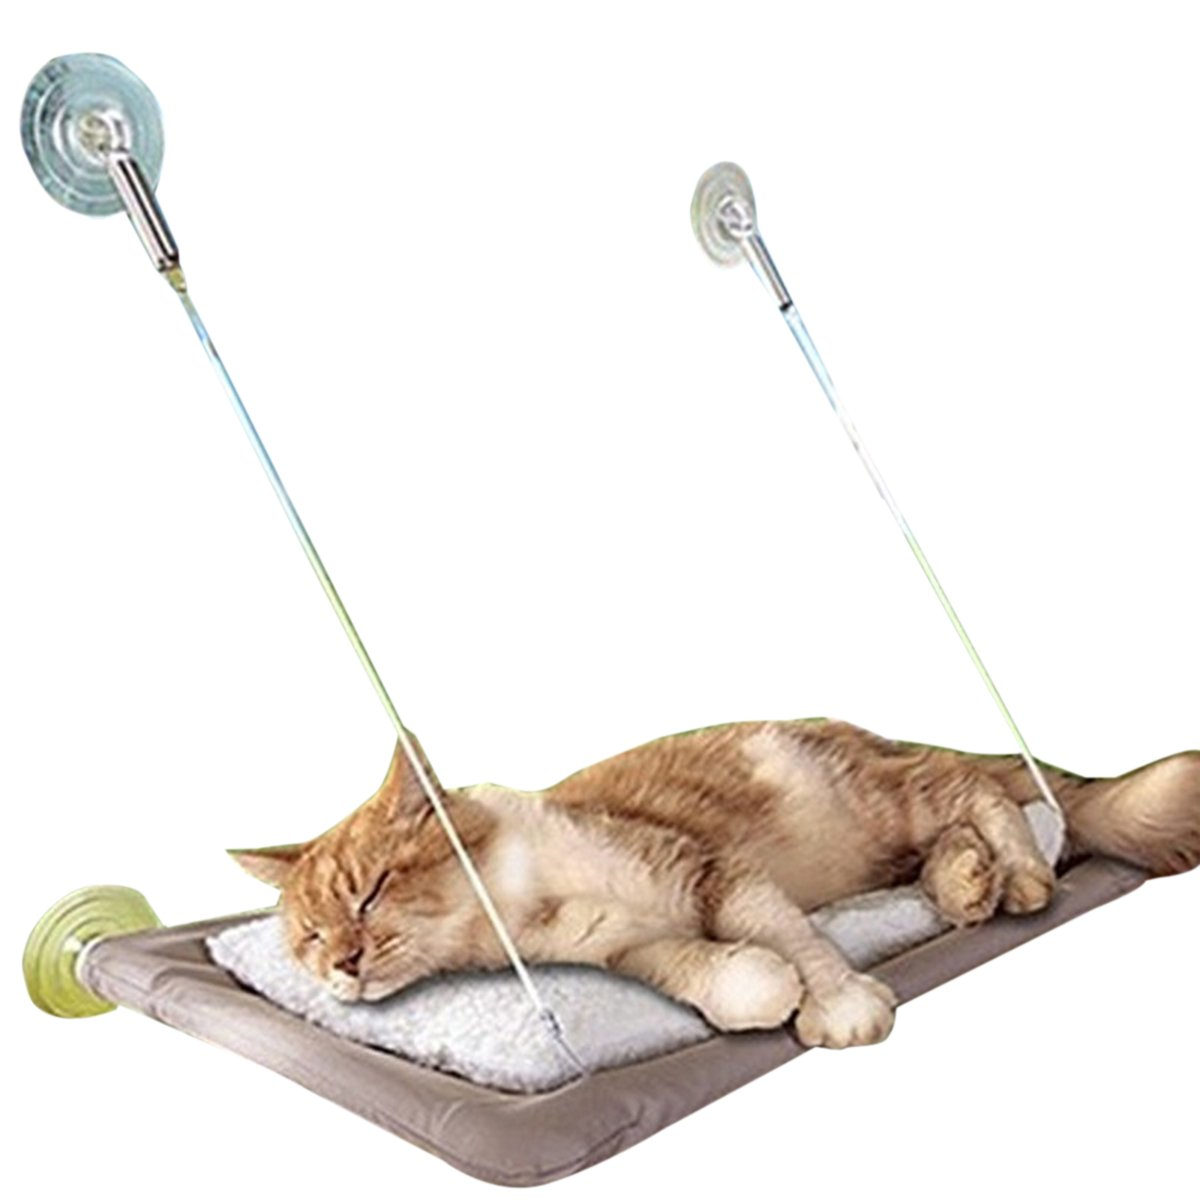 Adorrable Cat Hammock Window Mounted Sunny Seat Resting Safe Kitty Sill Cozy Cat Perch, Grey, Medium